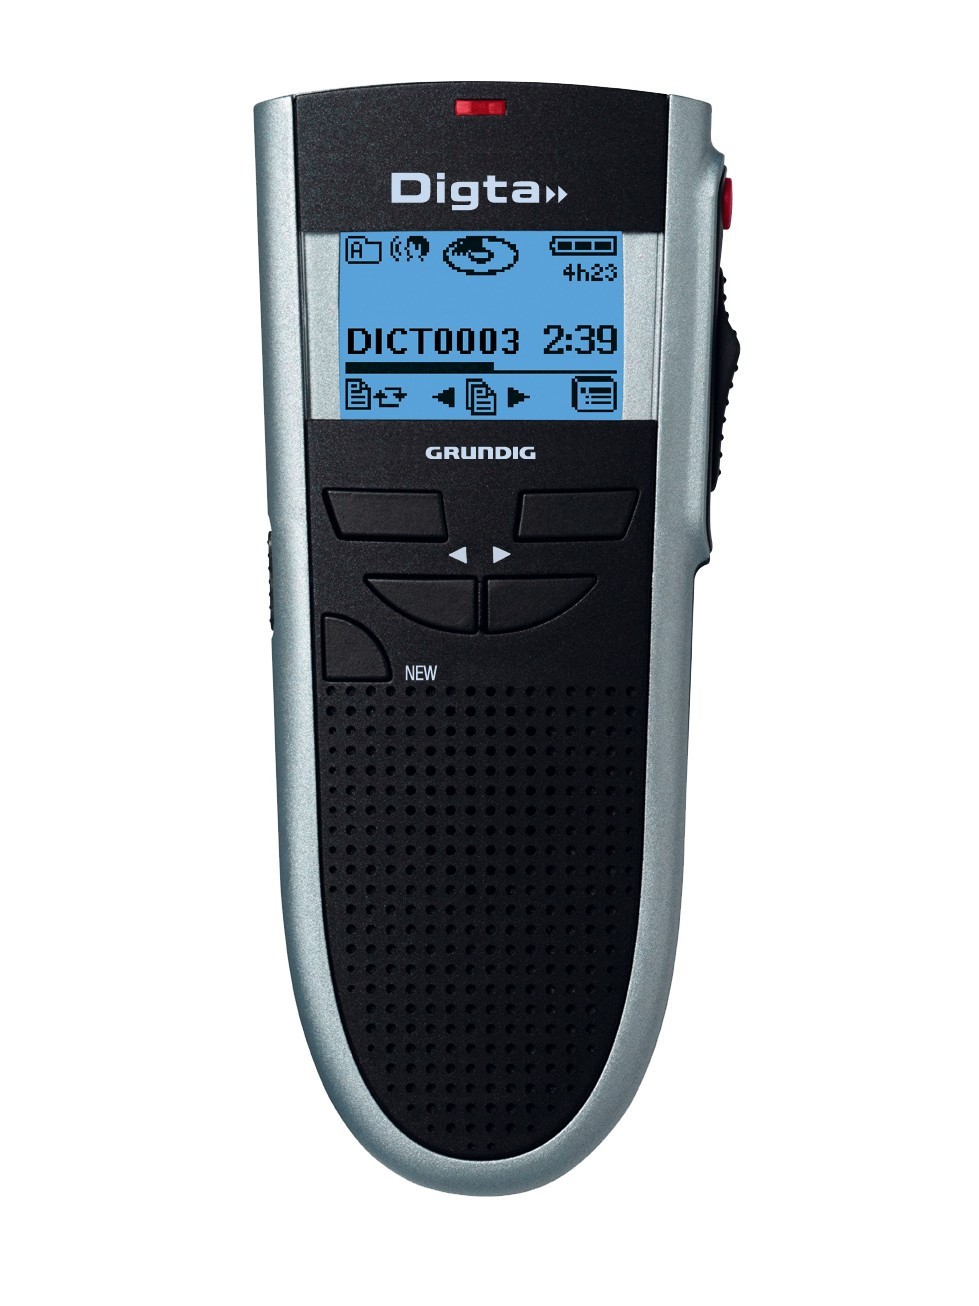 Grundig Digta 415 m DigtaSoft Pro